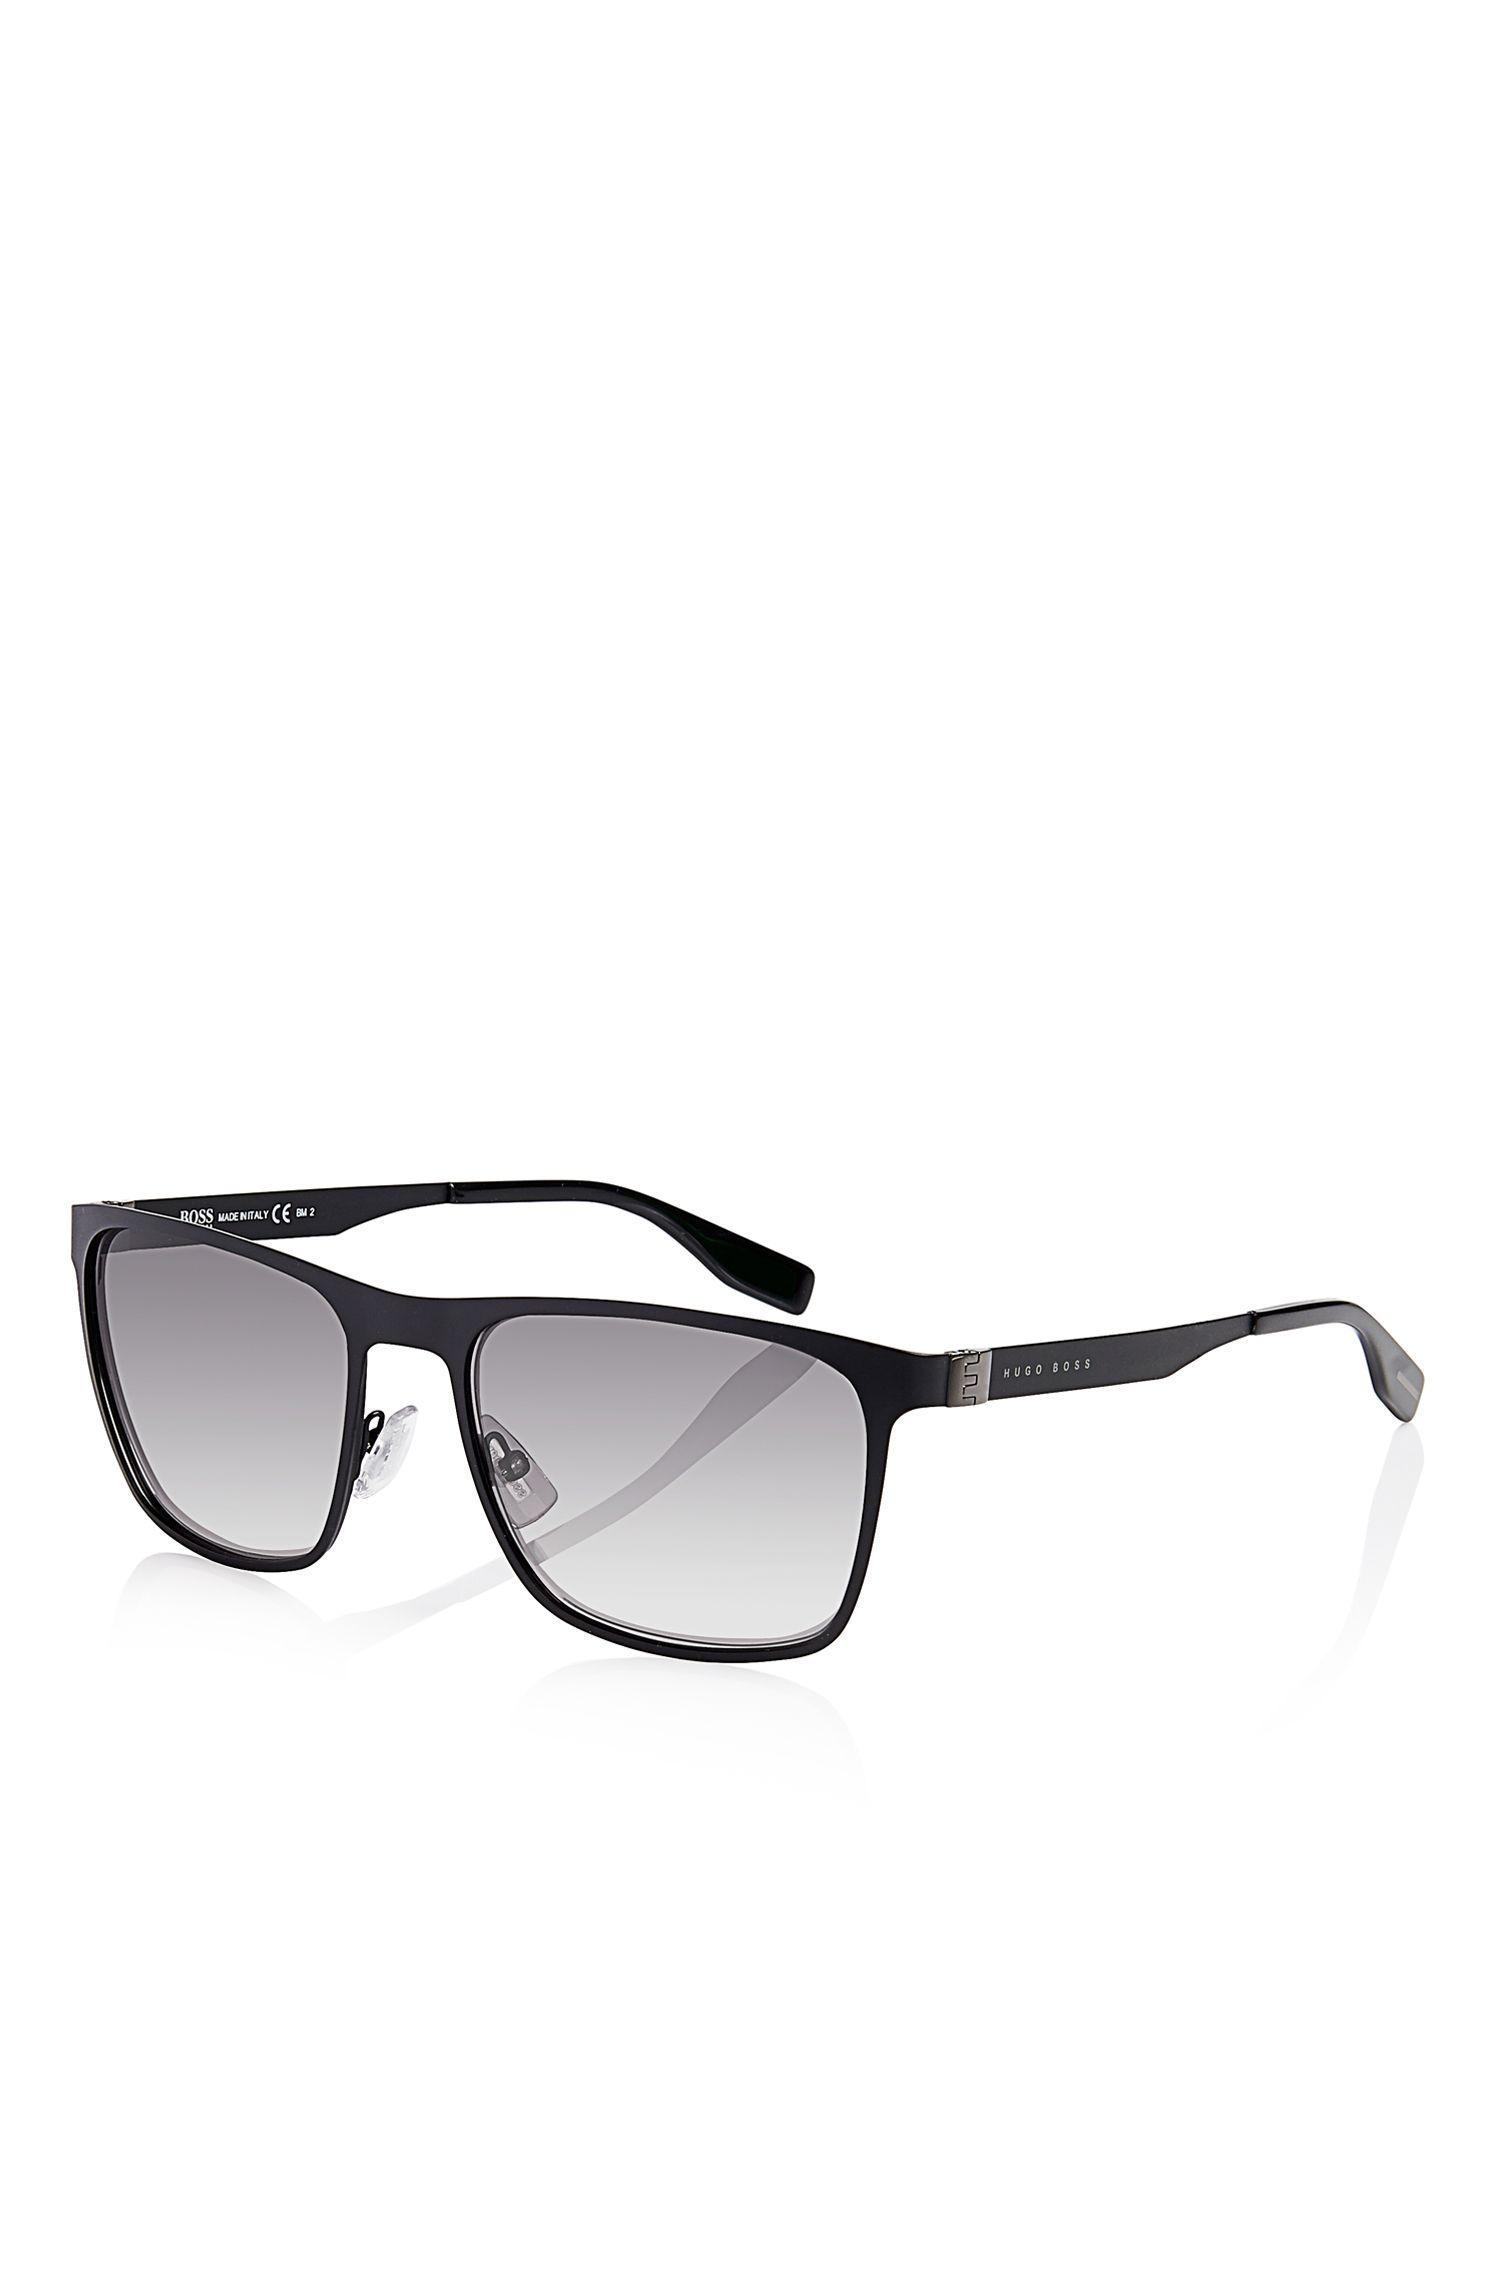 'Sunglasses' | Matte Black Flat Metal Sunglasses